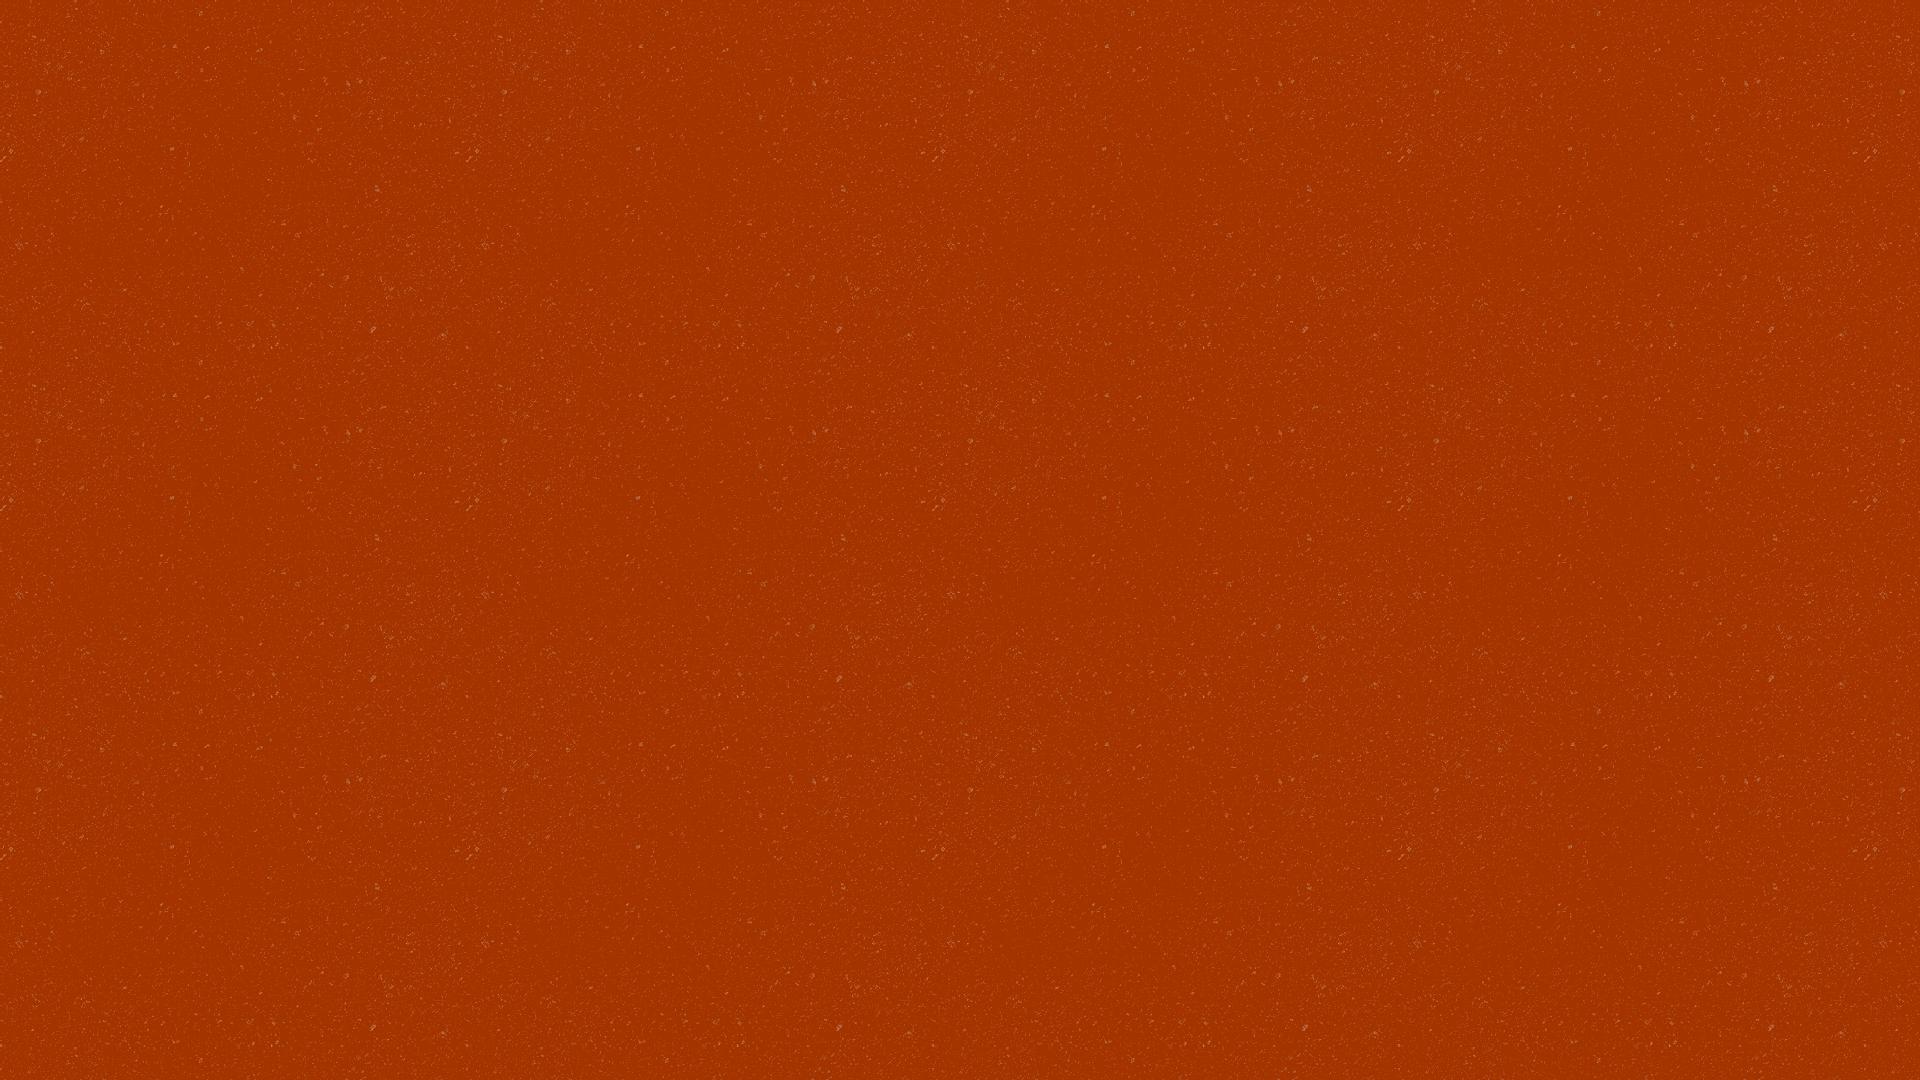 asfalt--light--1920x1080.png